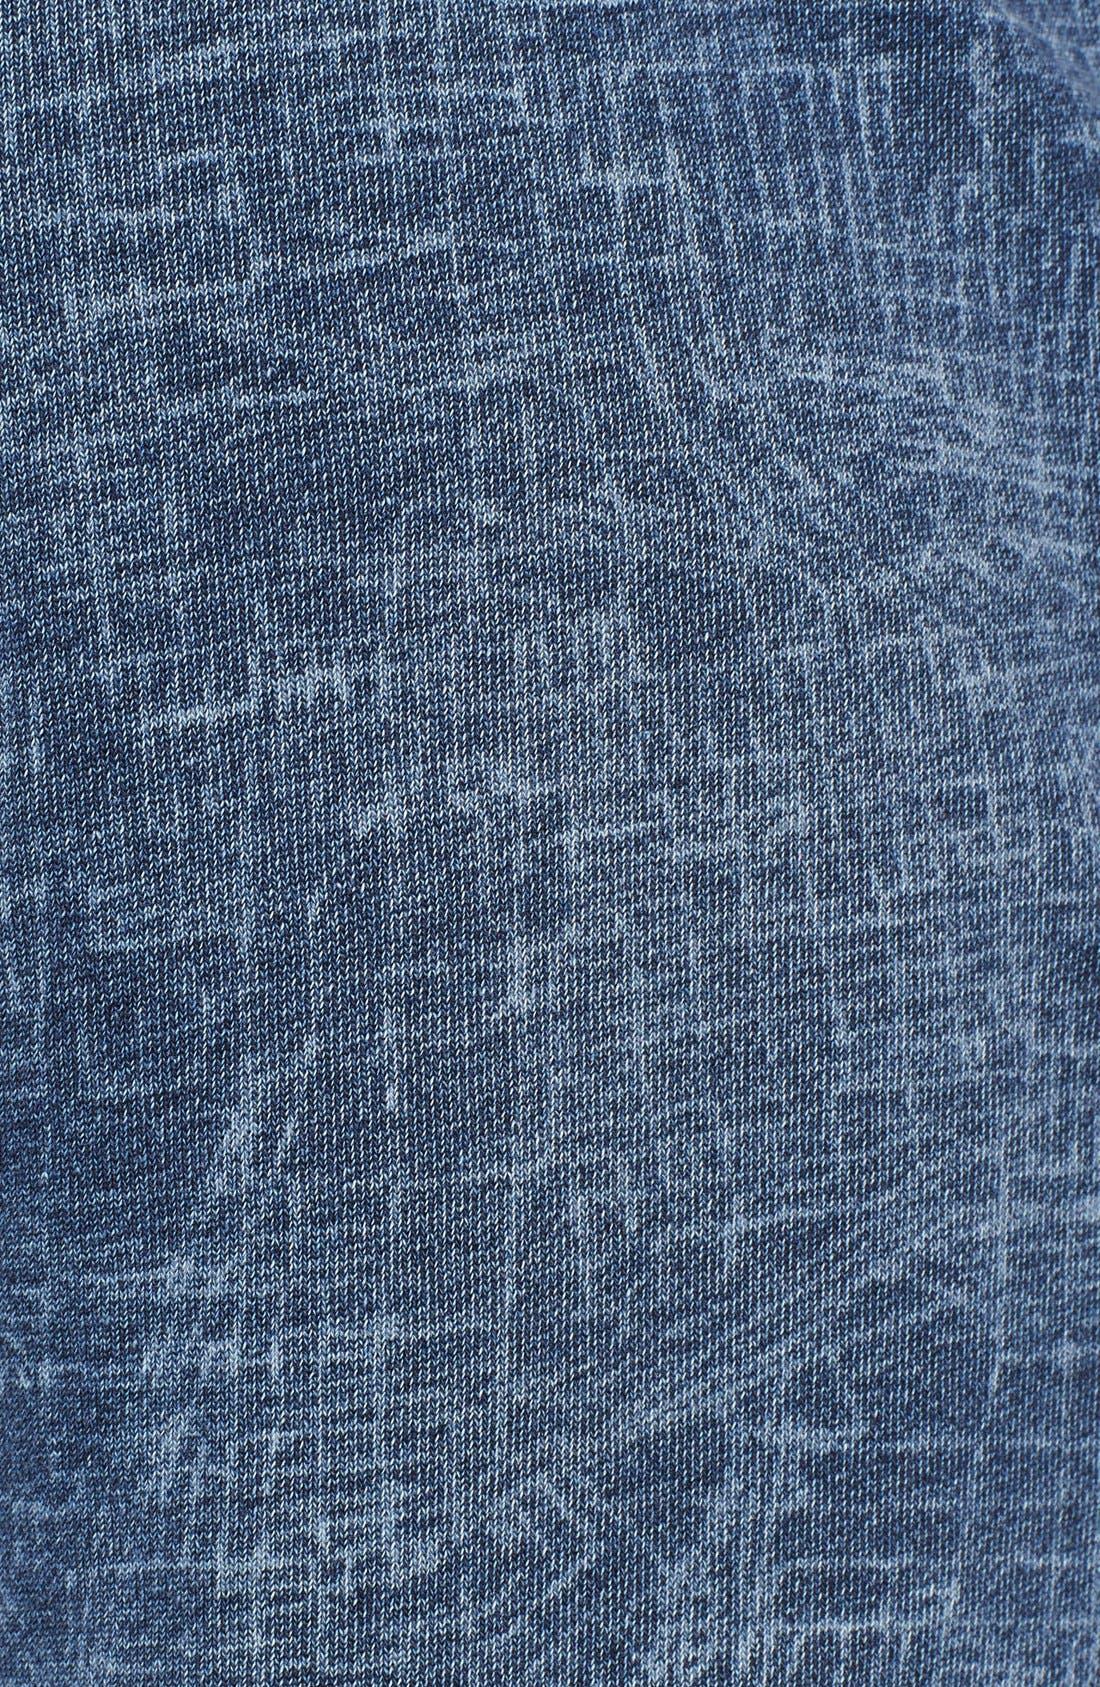 Alternate Image 3  - Current/Elliott 'The Slim Vintage' Cropped Sweatpants